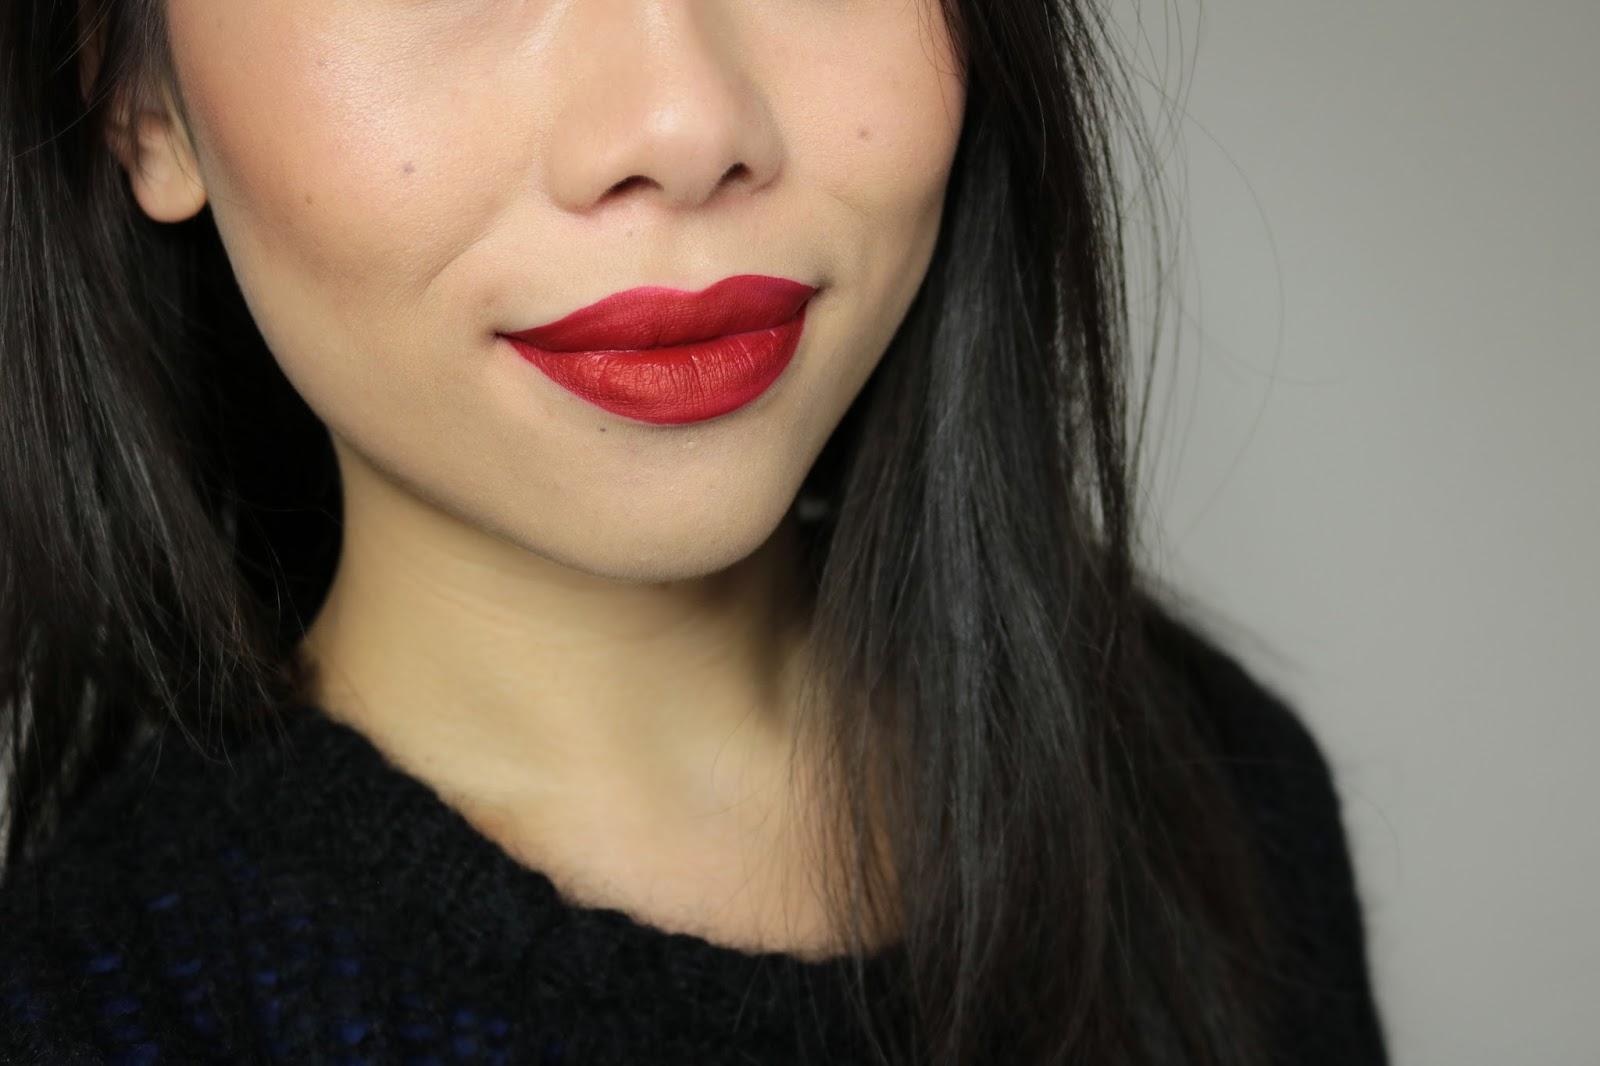 Les Everlasting Liquid Lipsticks de Kat Von D Outlaw